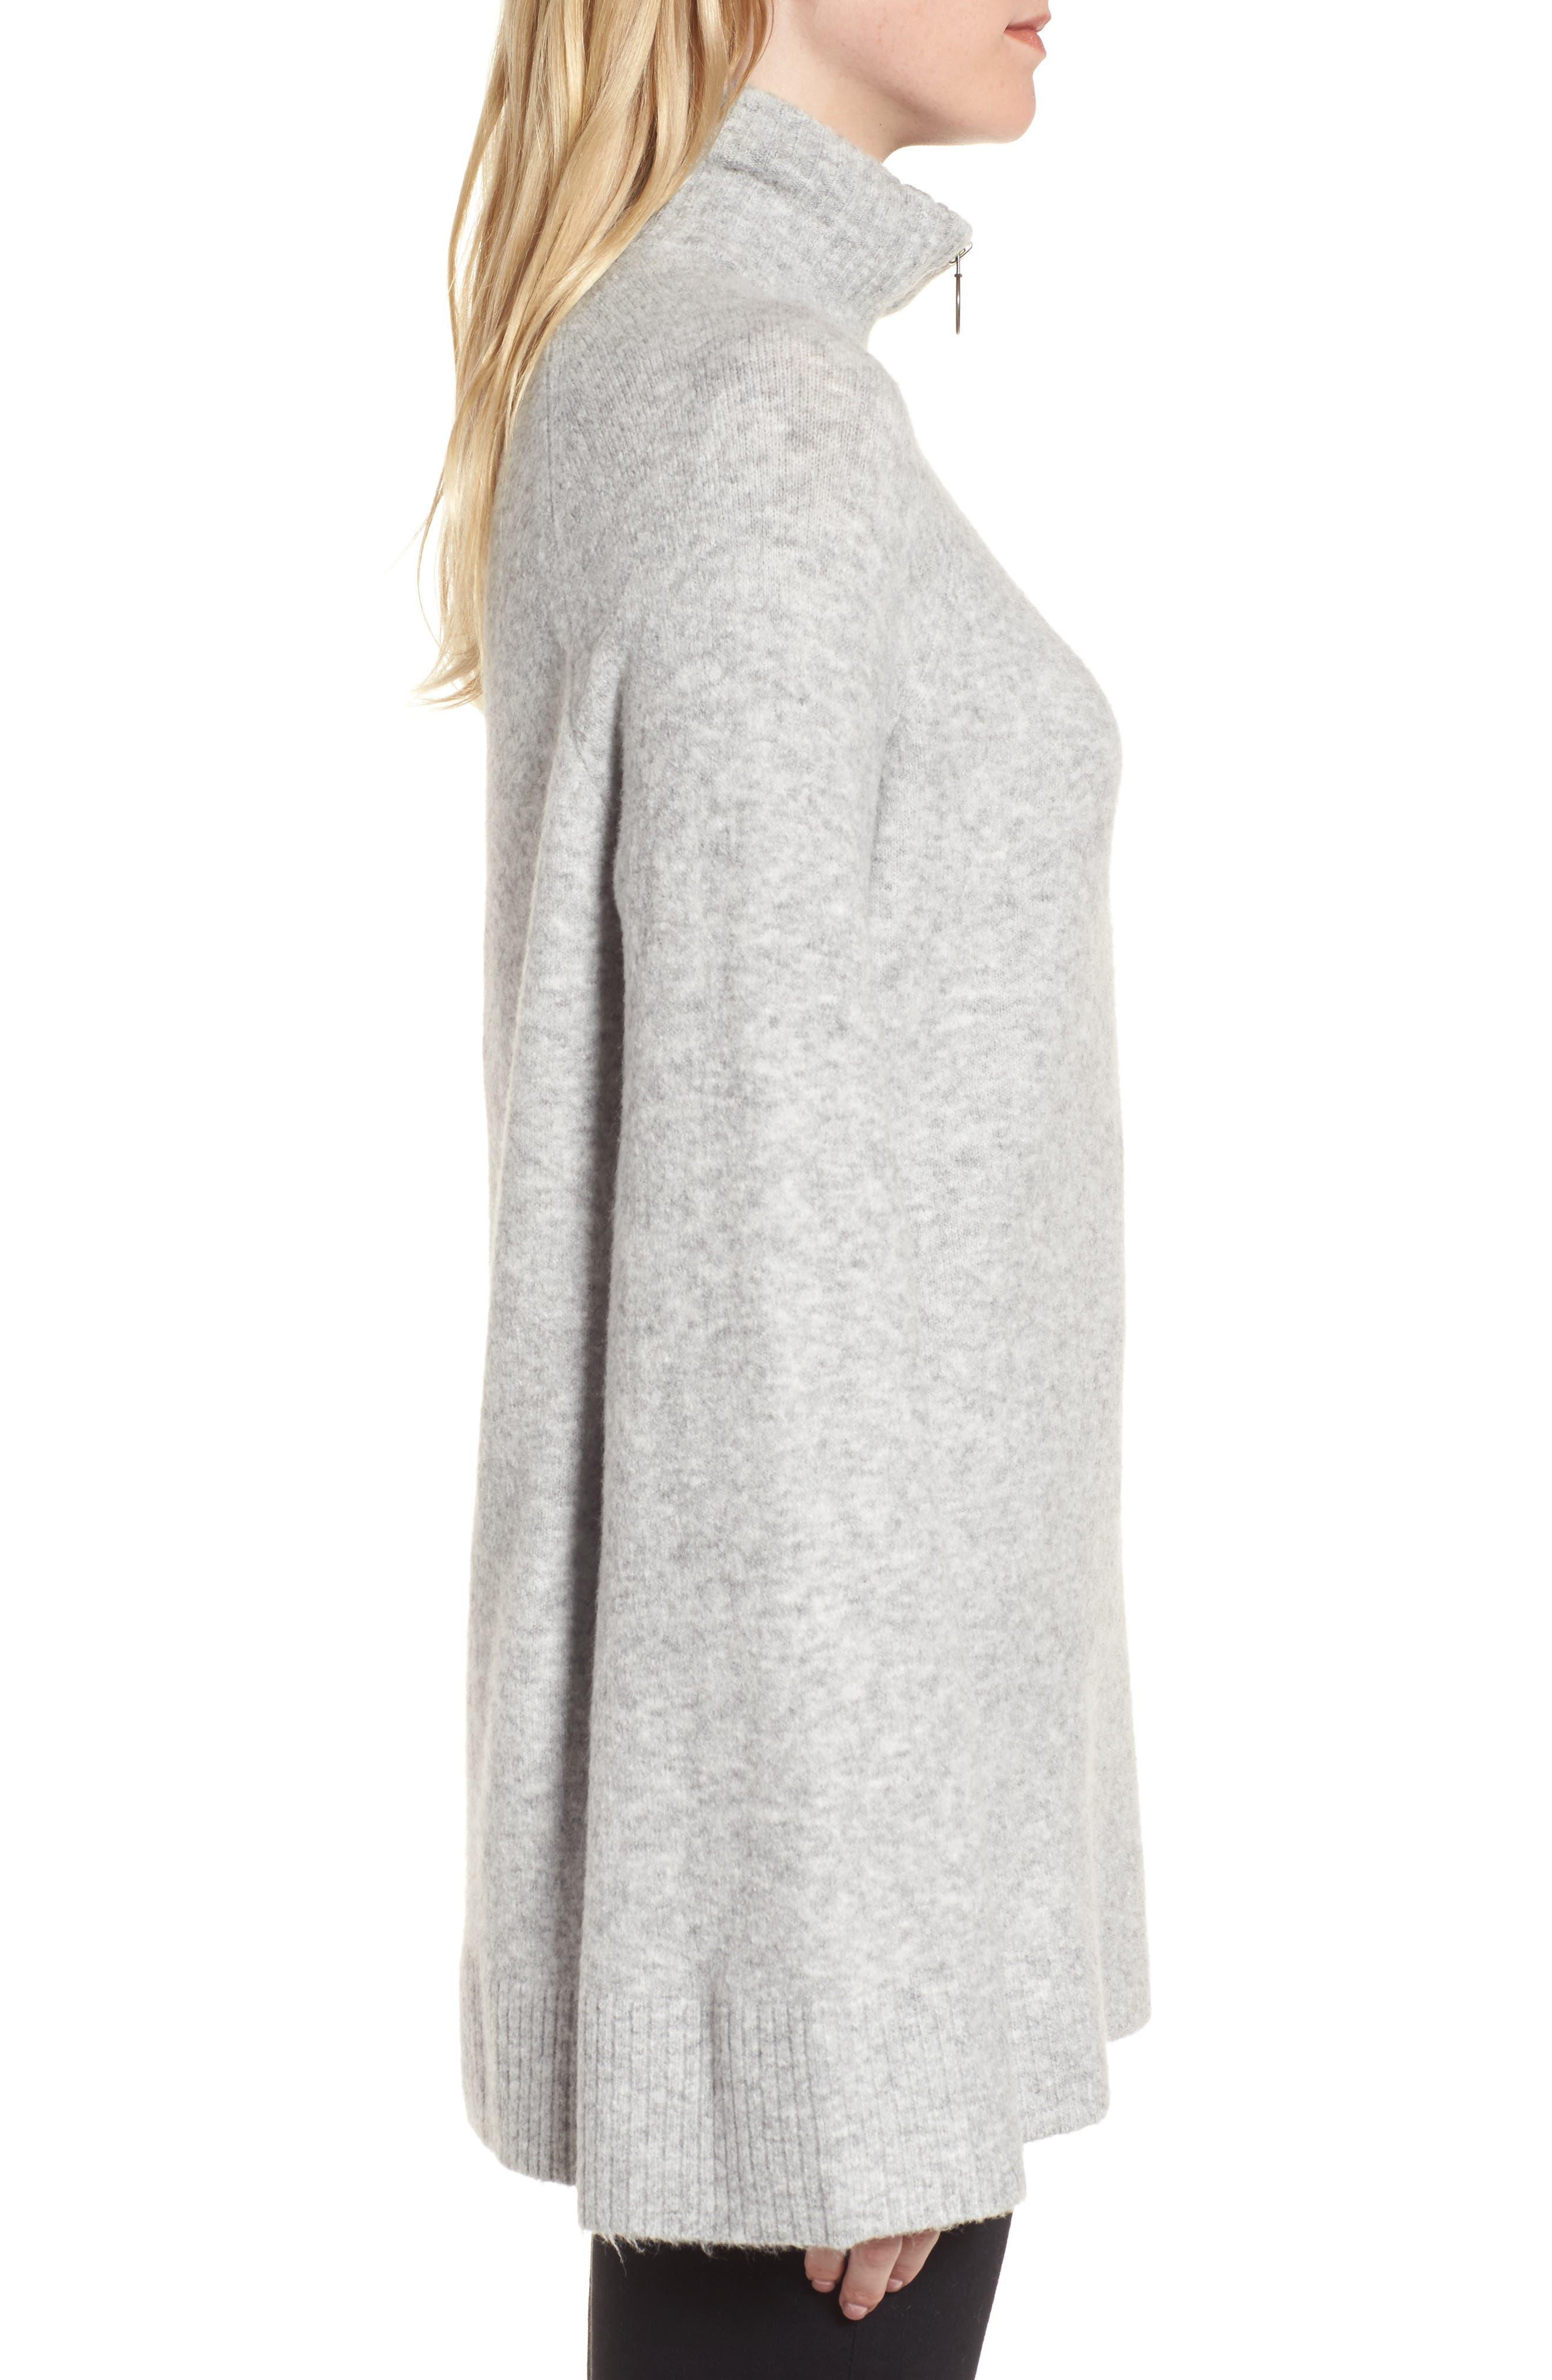 Half Zip Pullover,                             Alternate thumbnail 3, color,                             Grey Heather